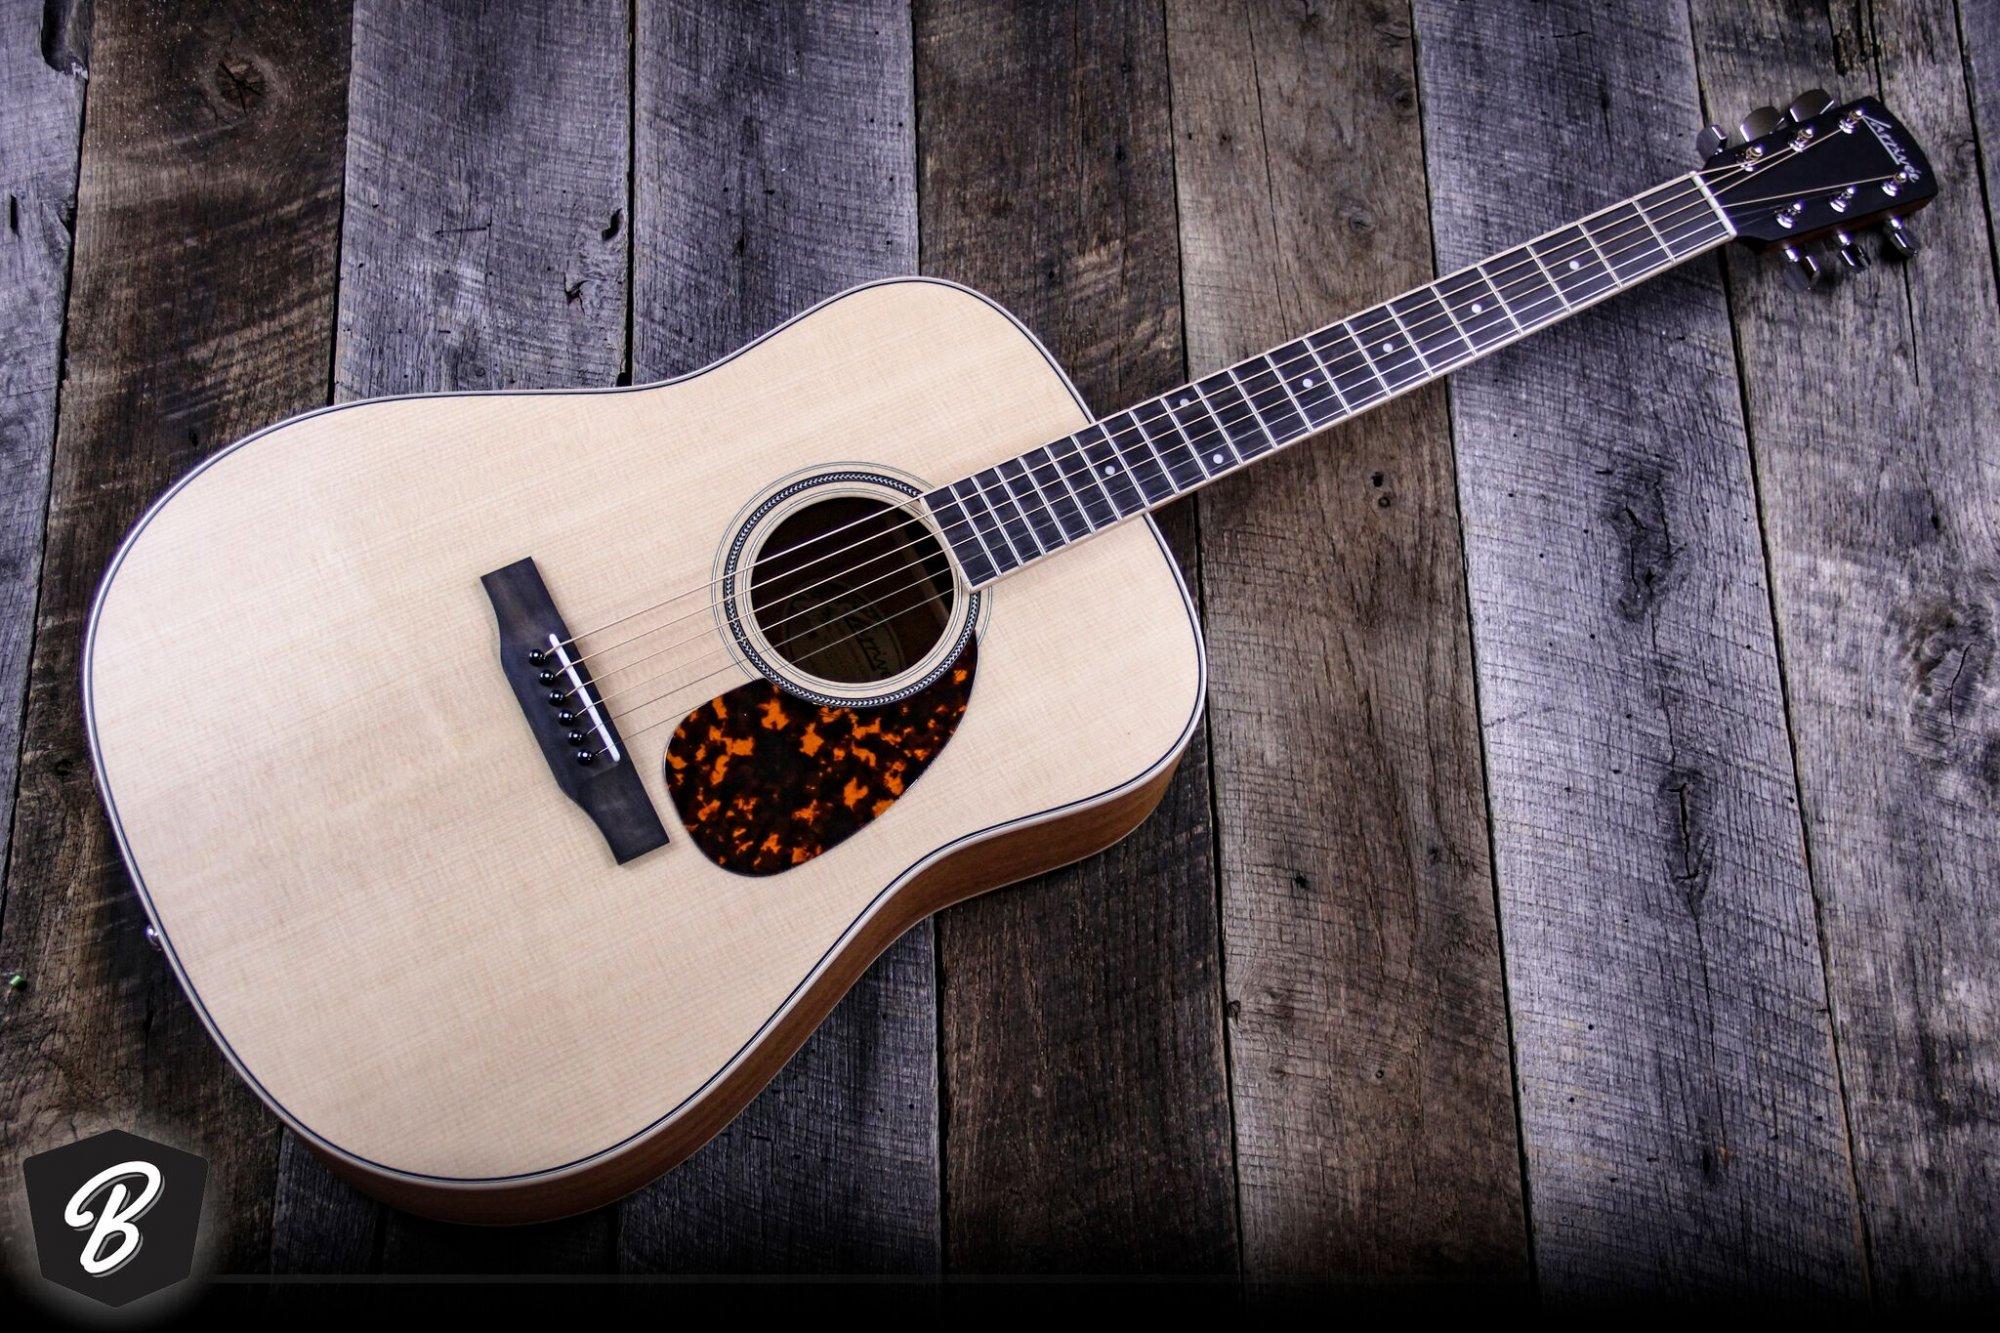 Larrivee D-03 Mahogany Standard Acoustic Guitar w/Case